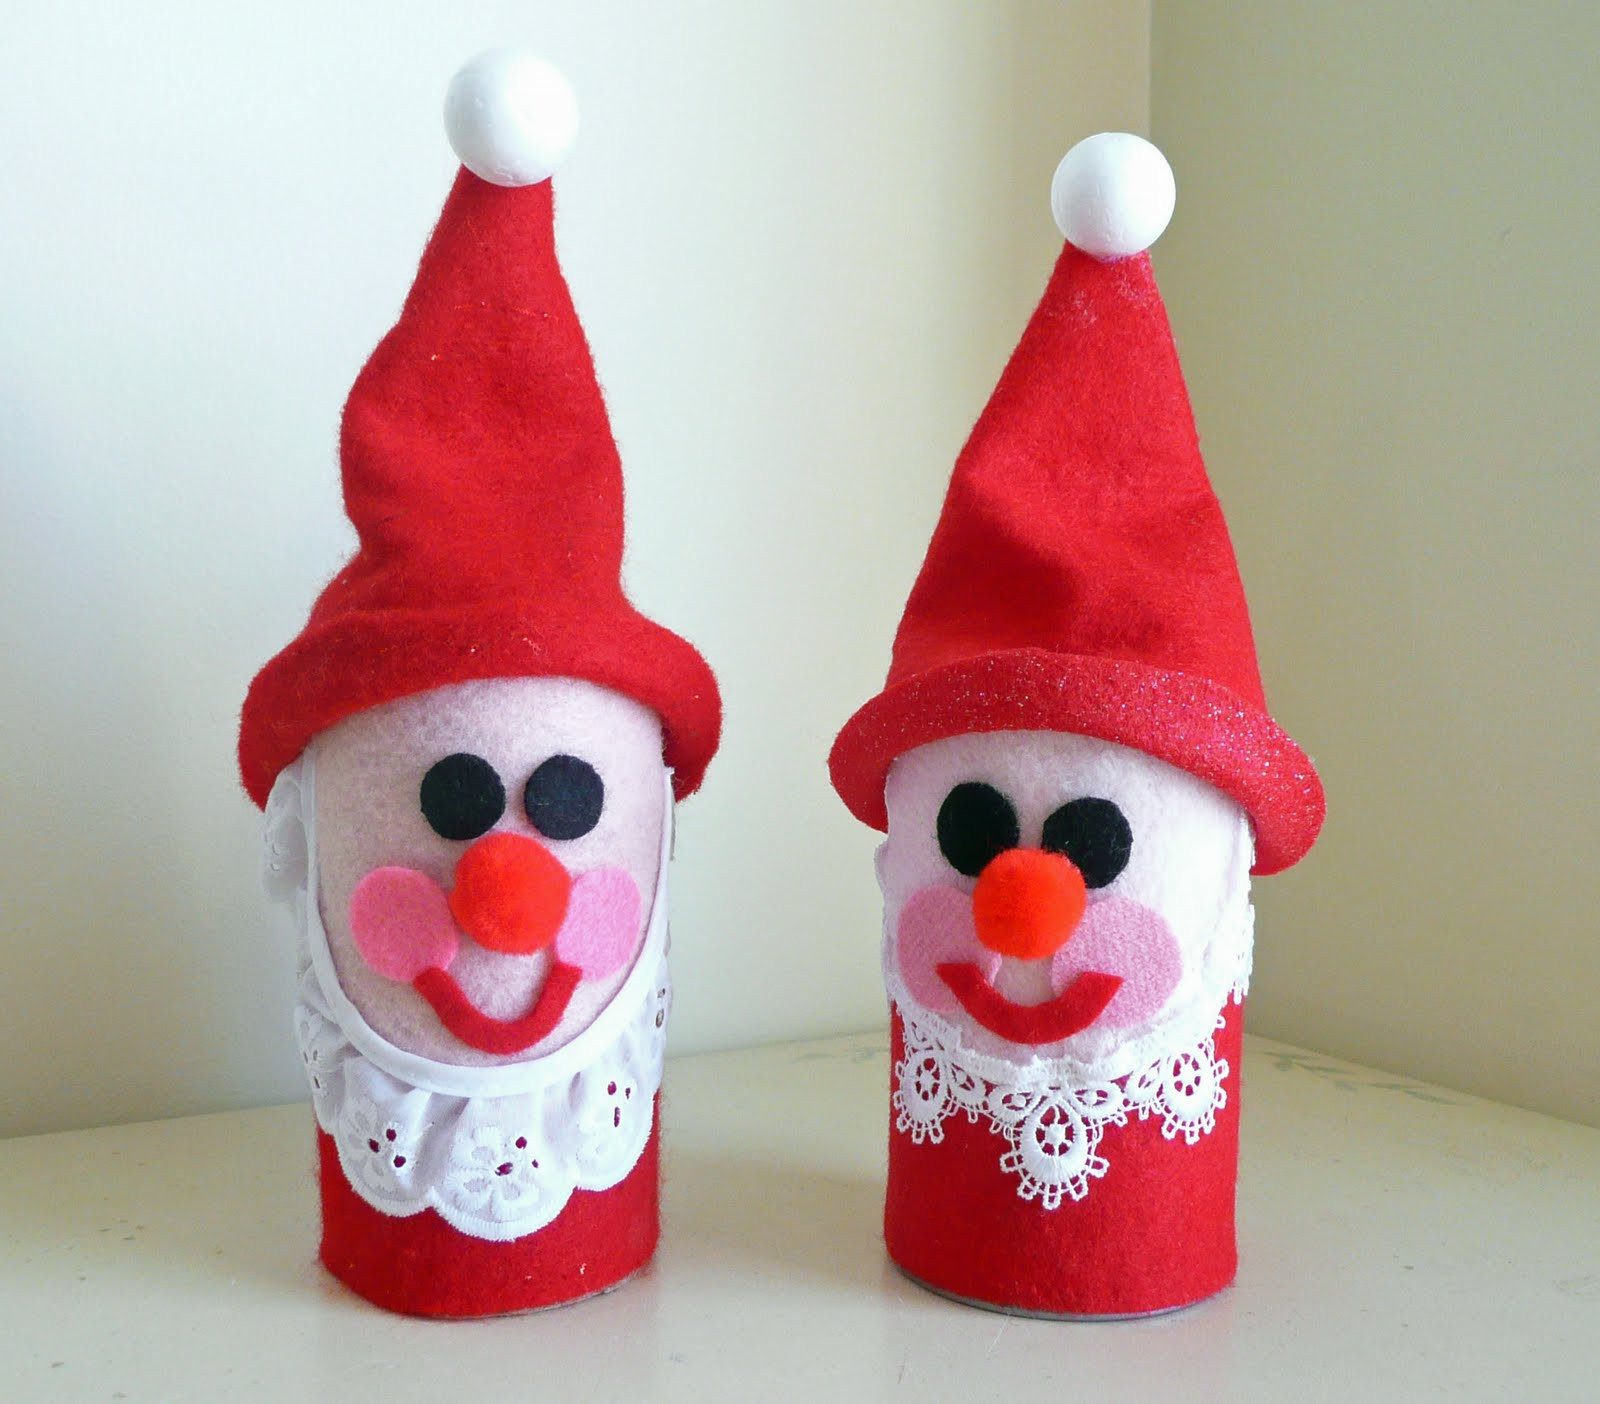 Christmas Craft Ideas For Kids  Preschool Crafts for Kids Toilet Roll Santa Christmas Craft